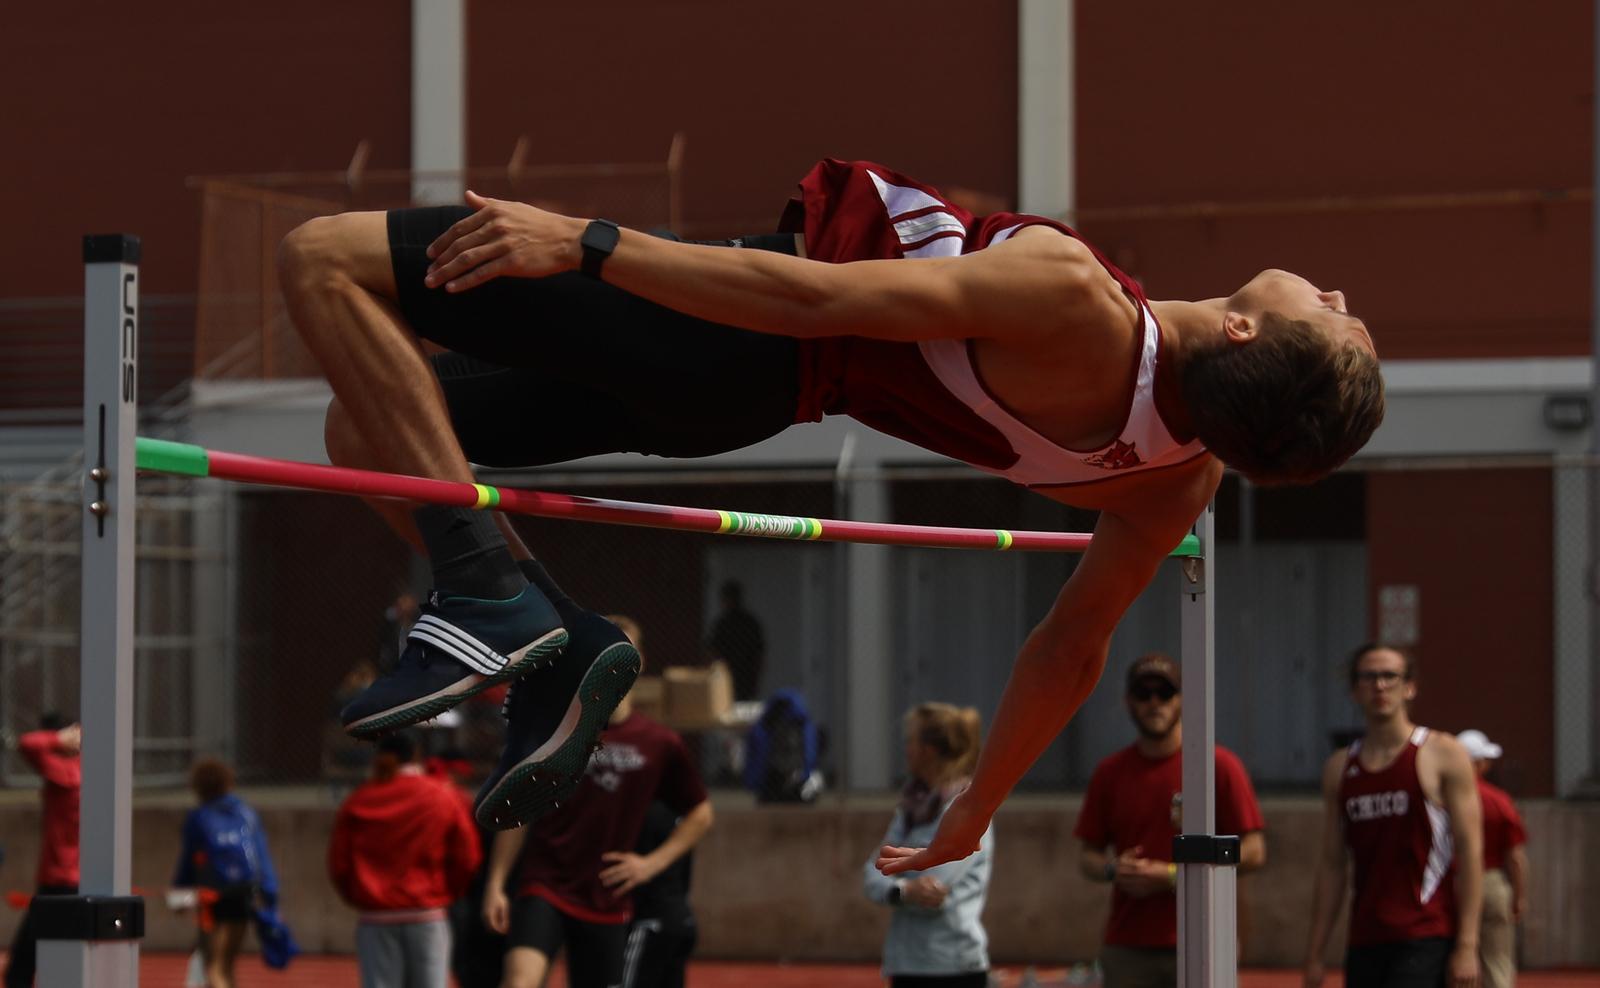 Chico State's Kyle Cox high jumps during the Twilight Invite, April 7, 2018, in Chico, California. (Carin Dorghalli -- Enterprise-Record)